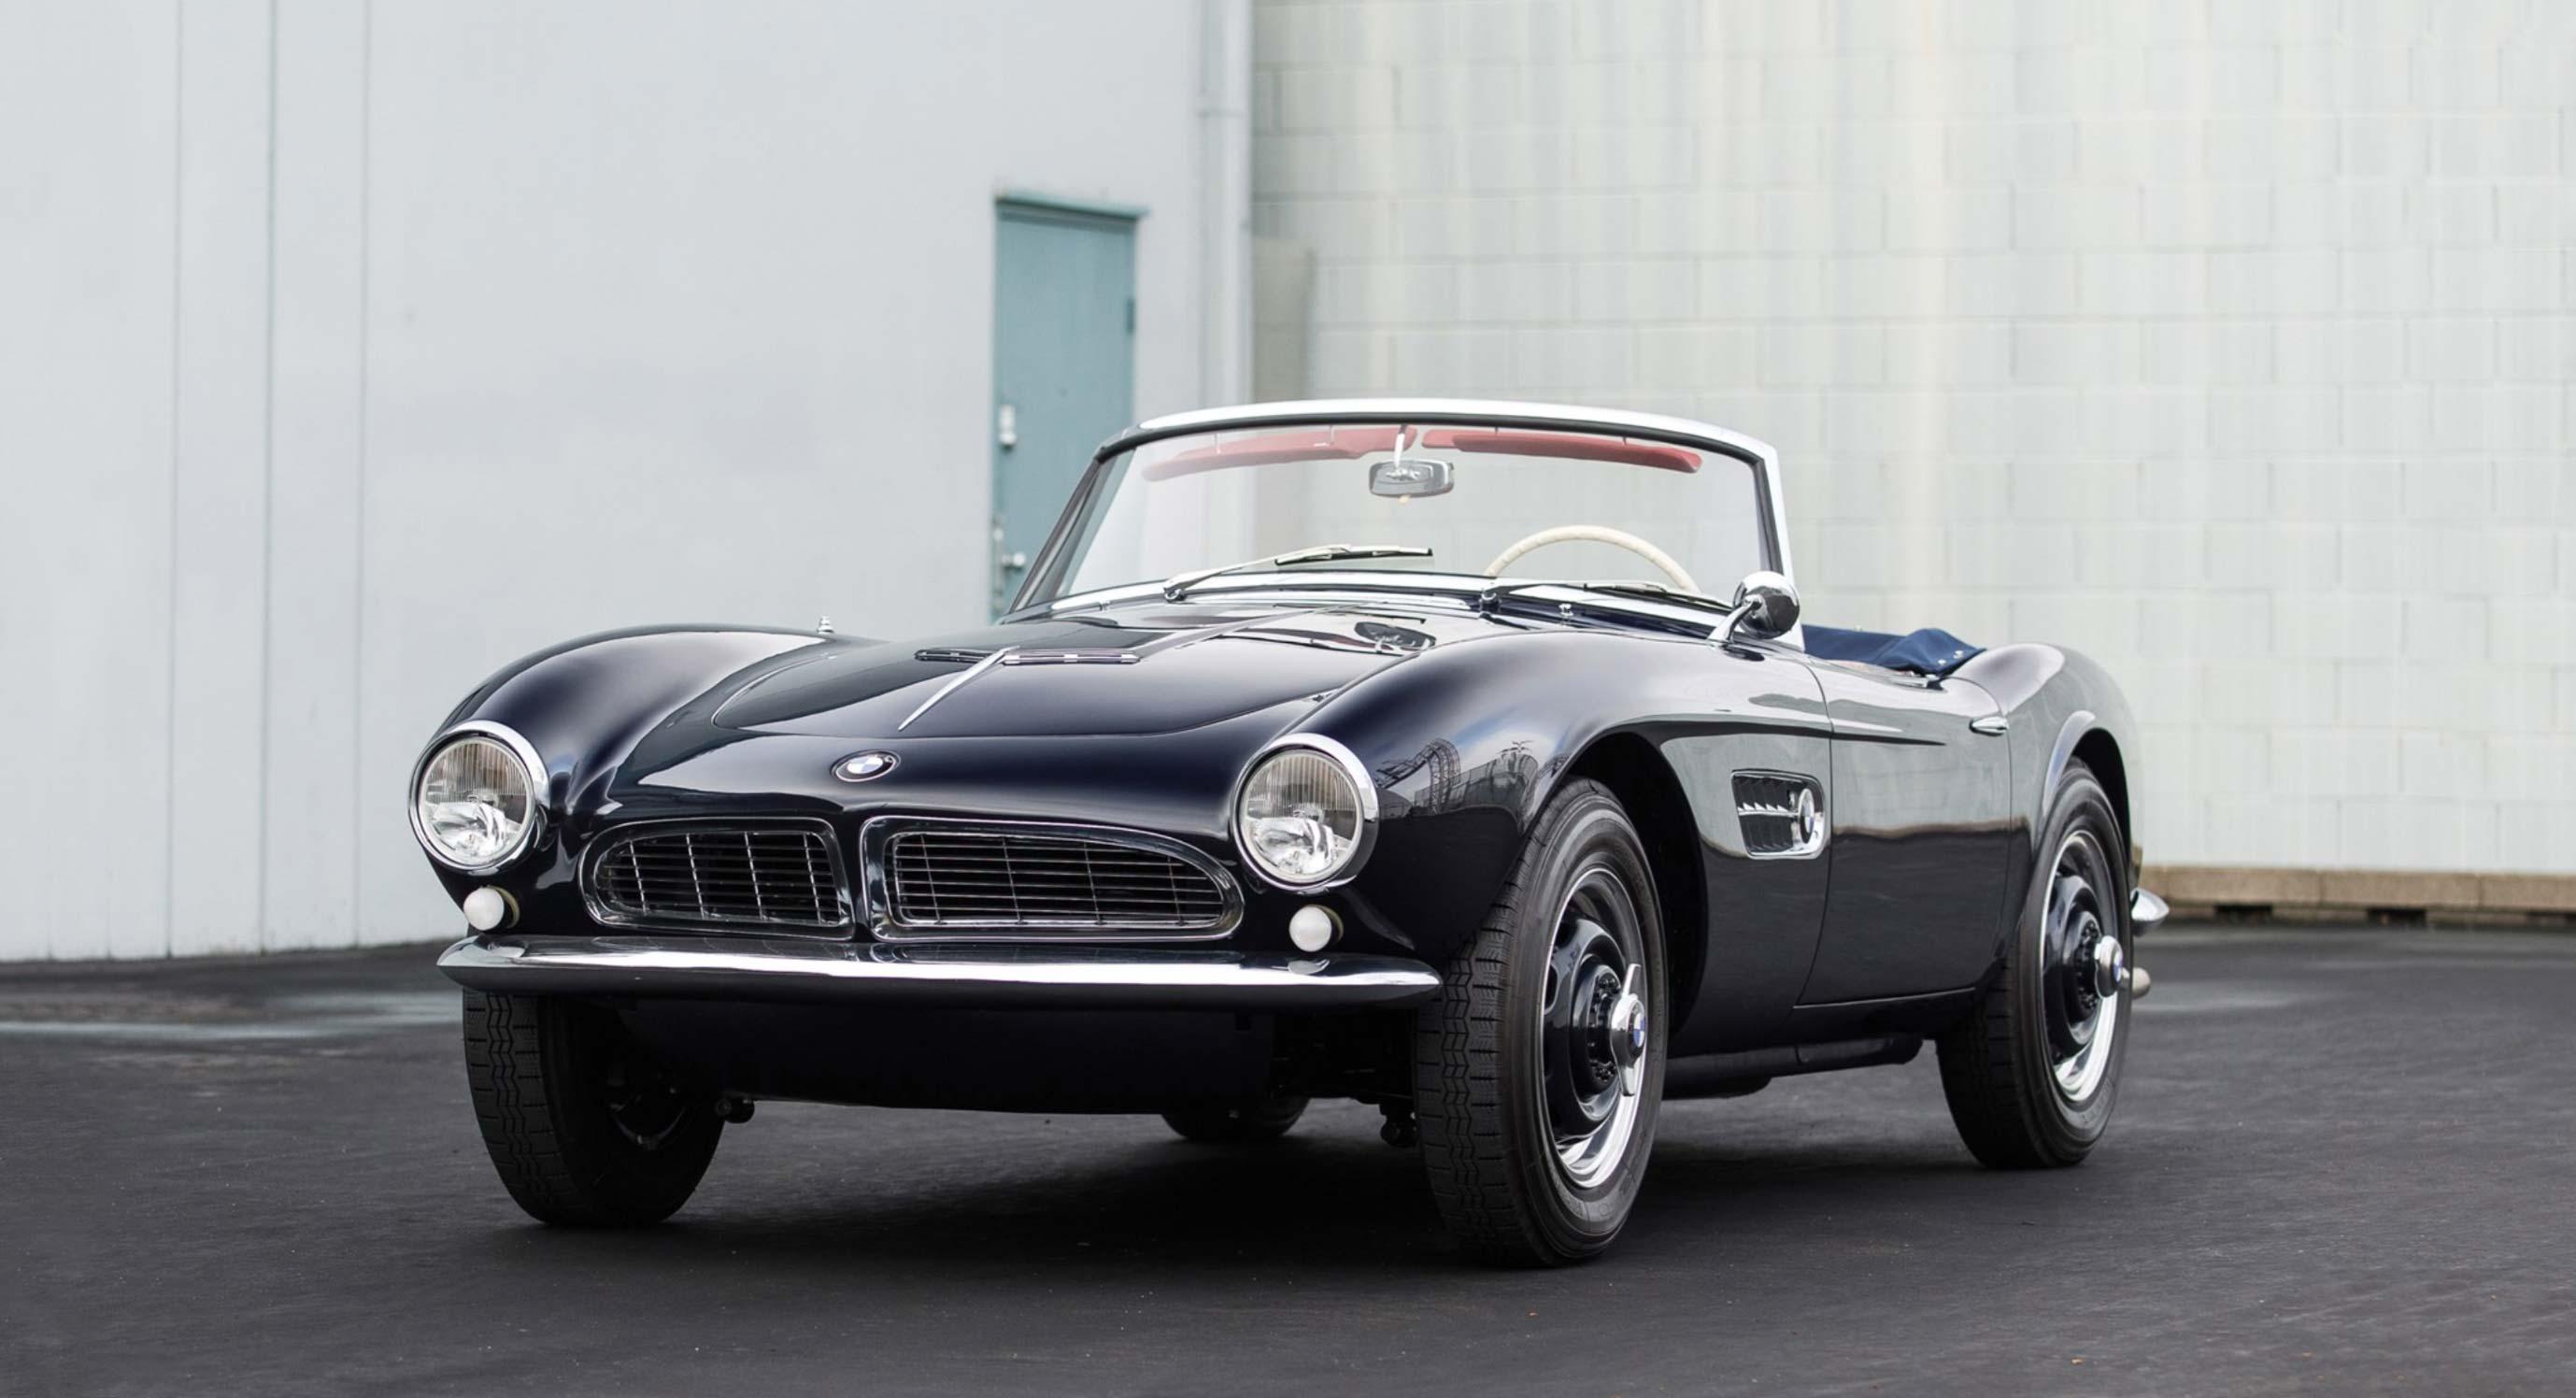 Classic Car Find of the Week: 1958 BMW 507 Roadster Series II